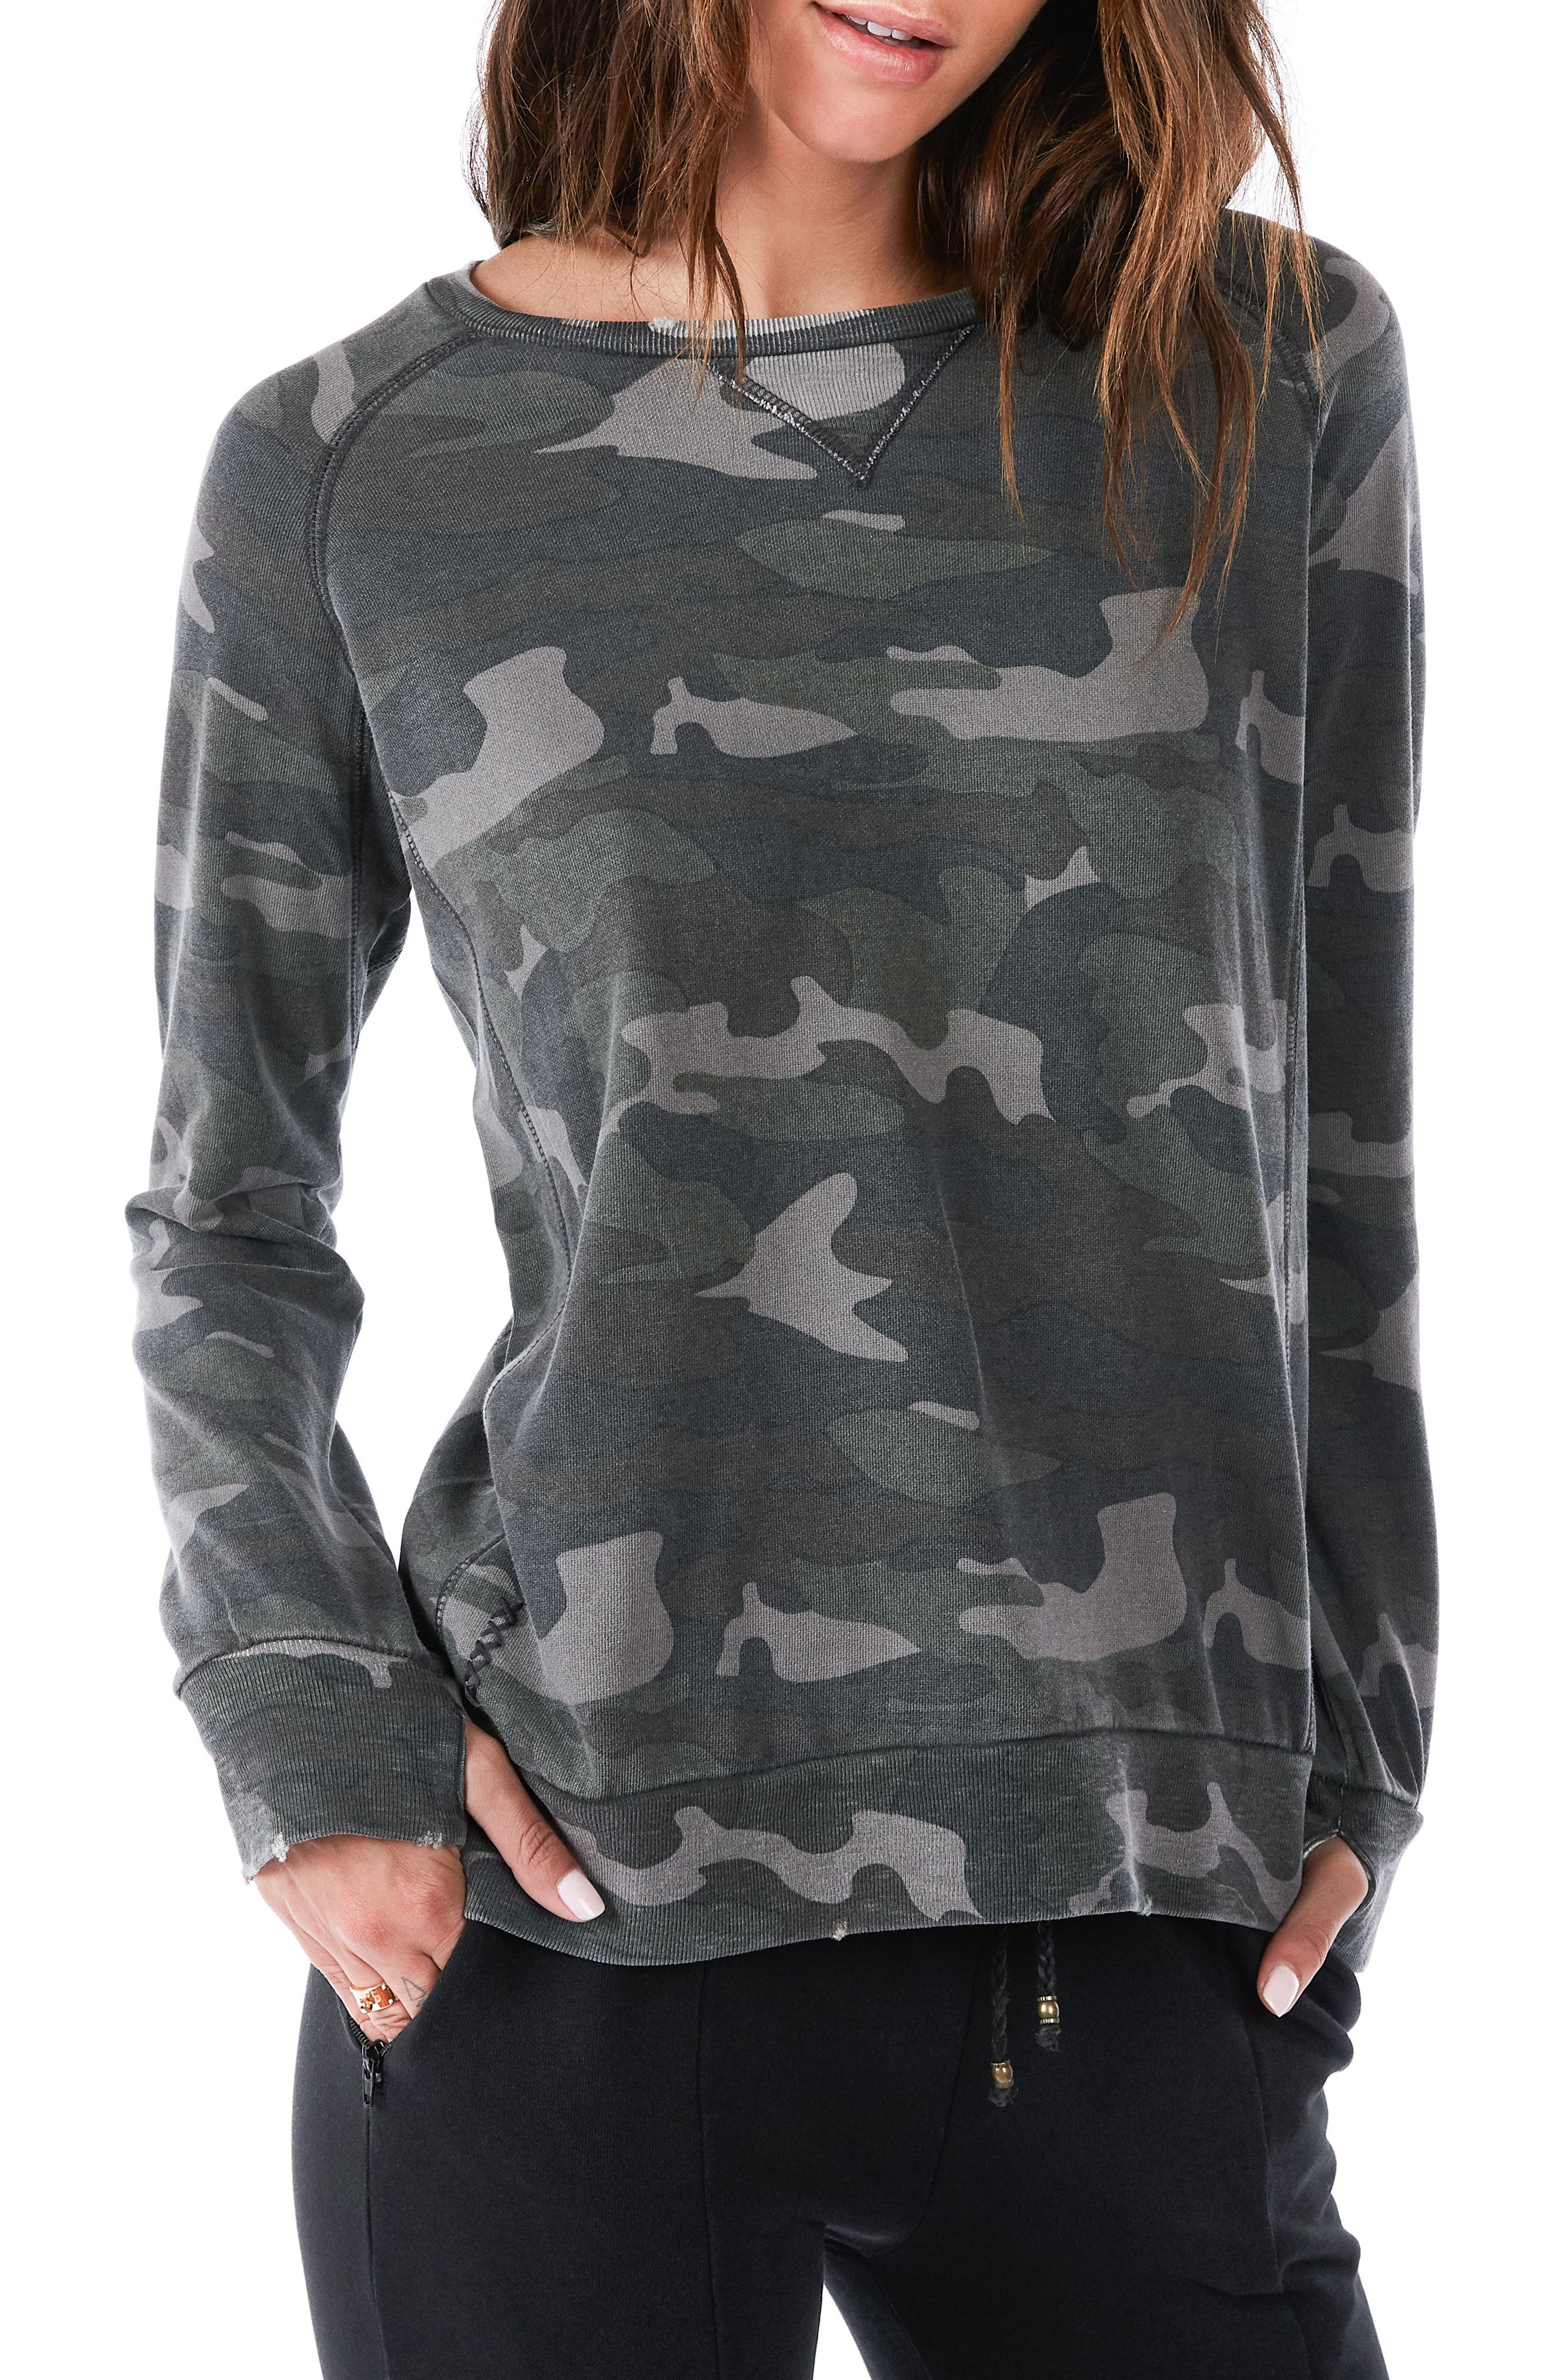 Ragdoll Distressed Camo Sweatshirt